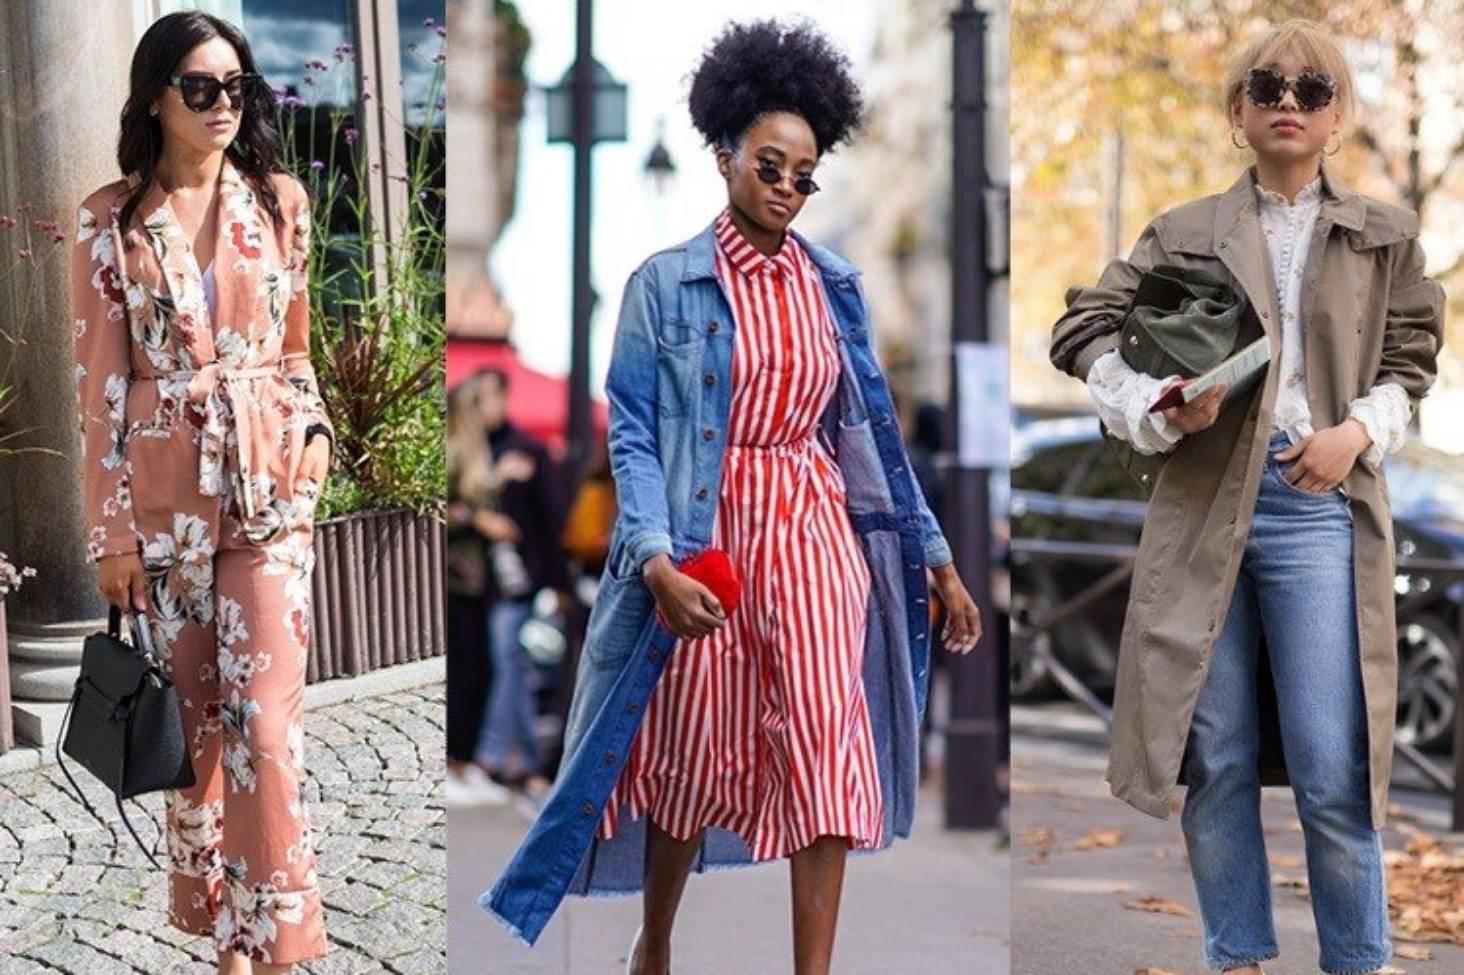 Trans-seasonal dressing: How to look stylish between seasons   Stuff.co.nz